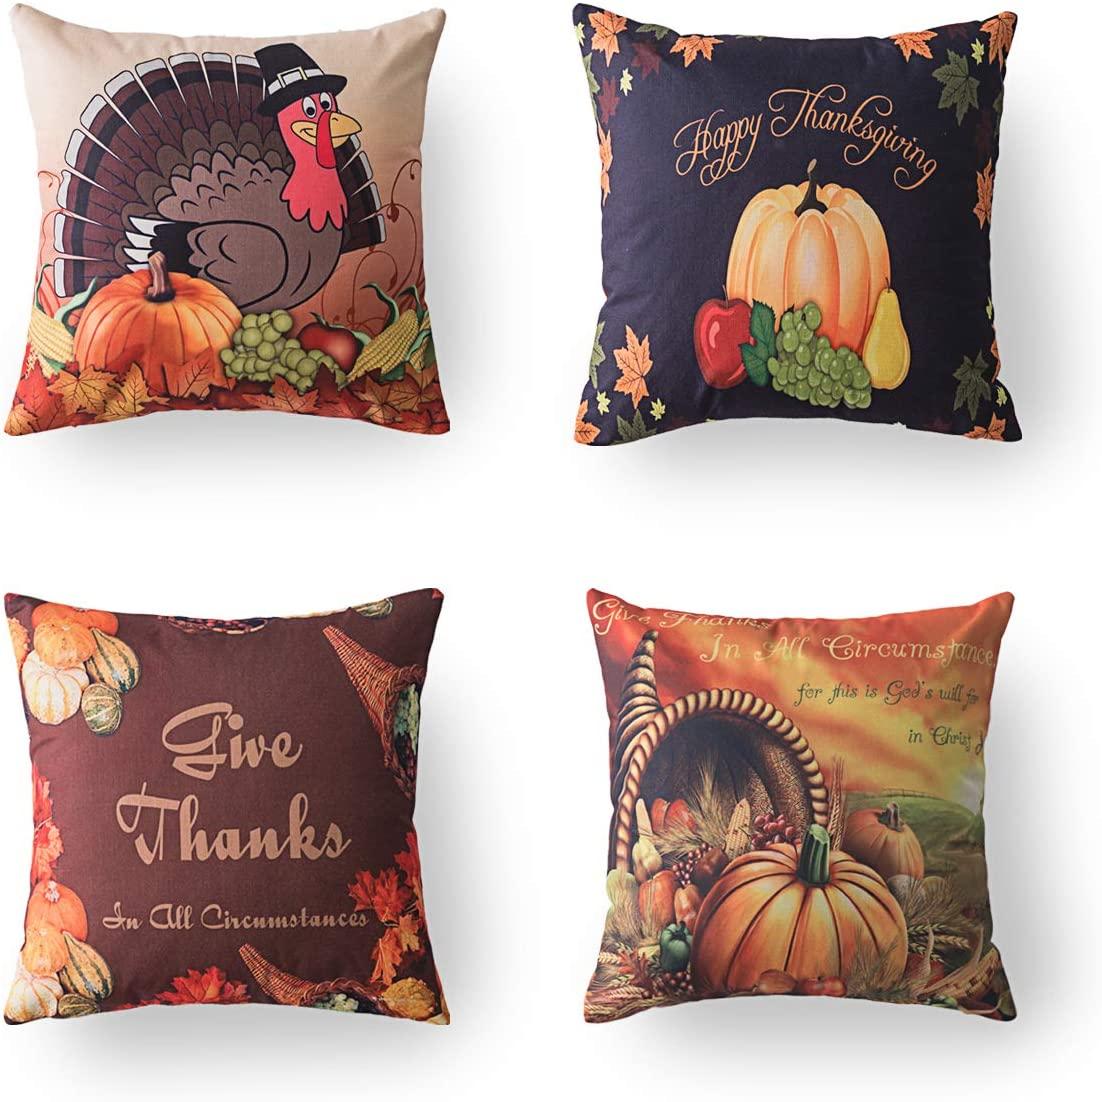 Xinrjojo 4 Pack Thanksgiving Fall Pumpkin Harvest Decorative Pillowcases Autumn Home Pillows Covers Cotton Linen 18x18 Inch